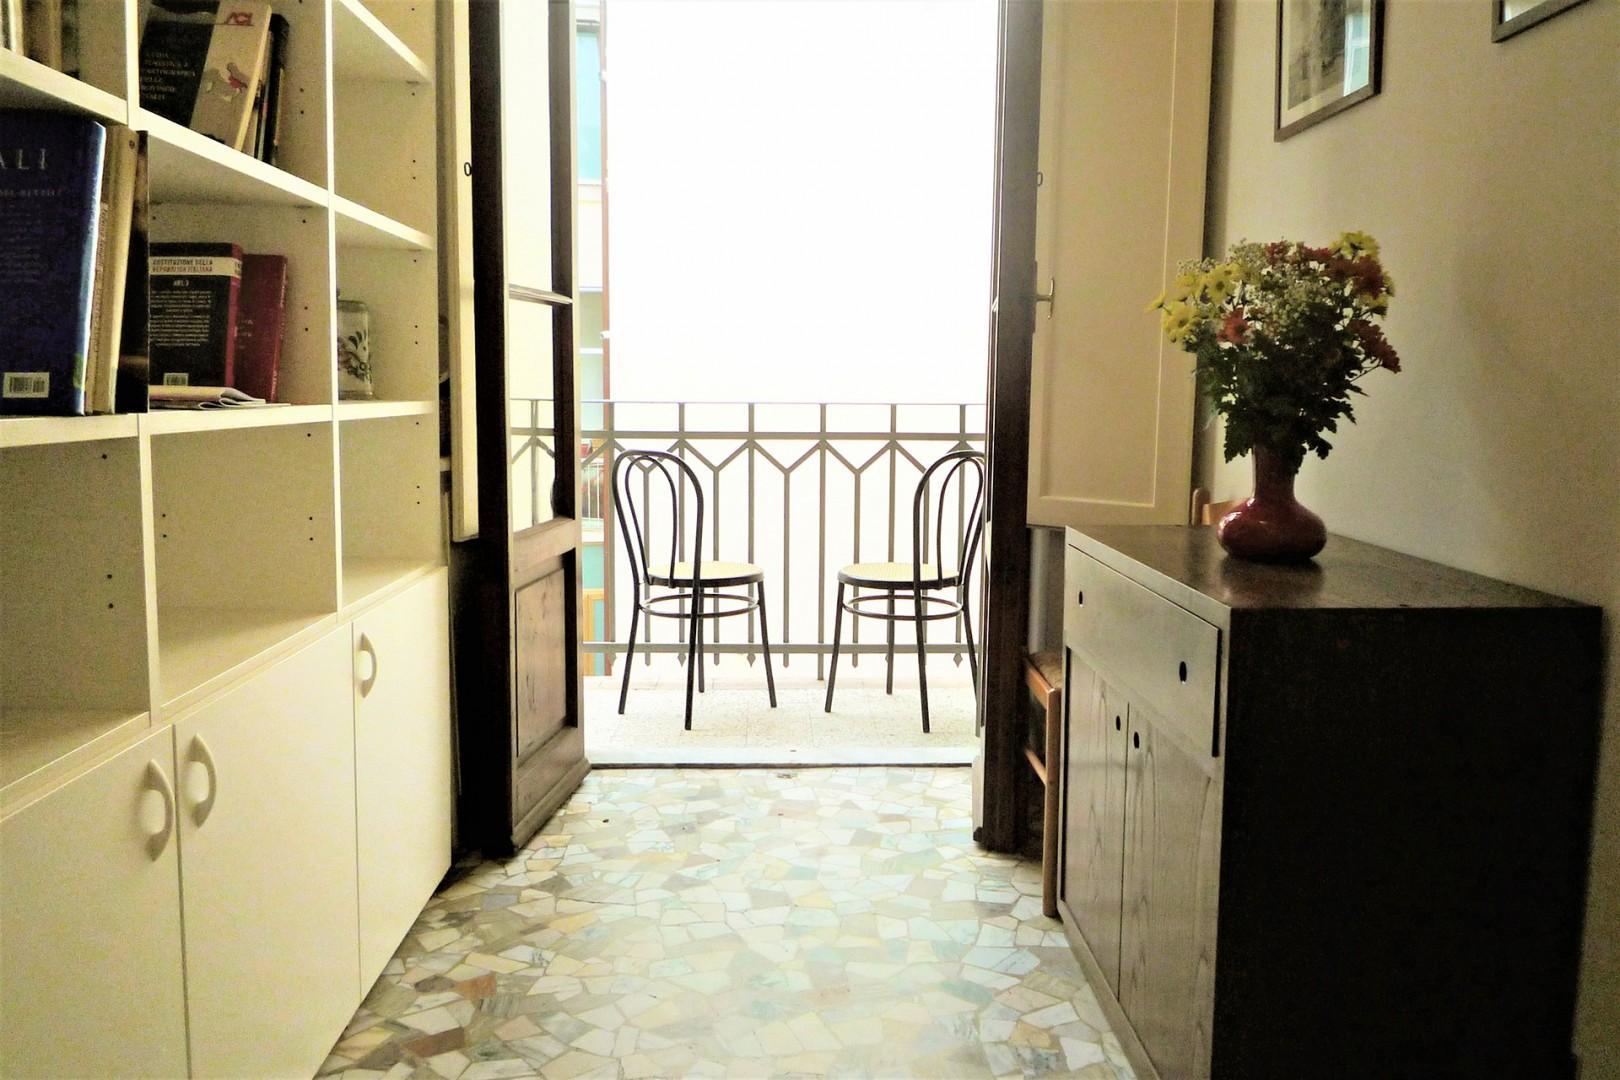 Hallway has a small balcony overlooking neighbors' gardens.